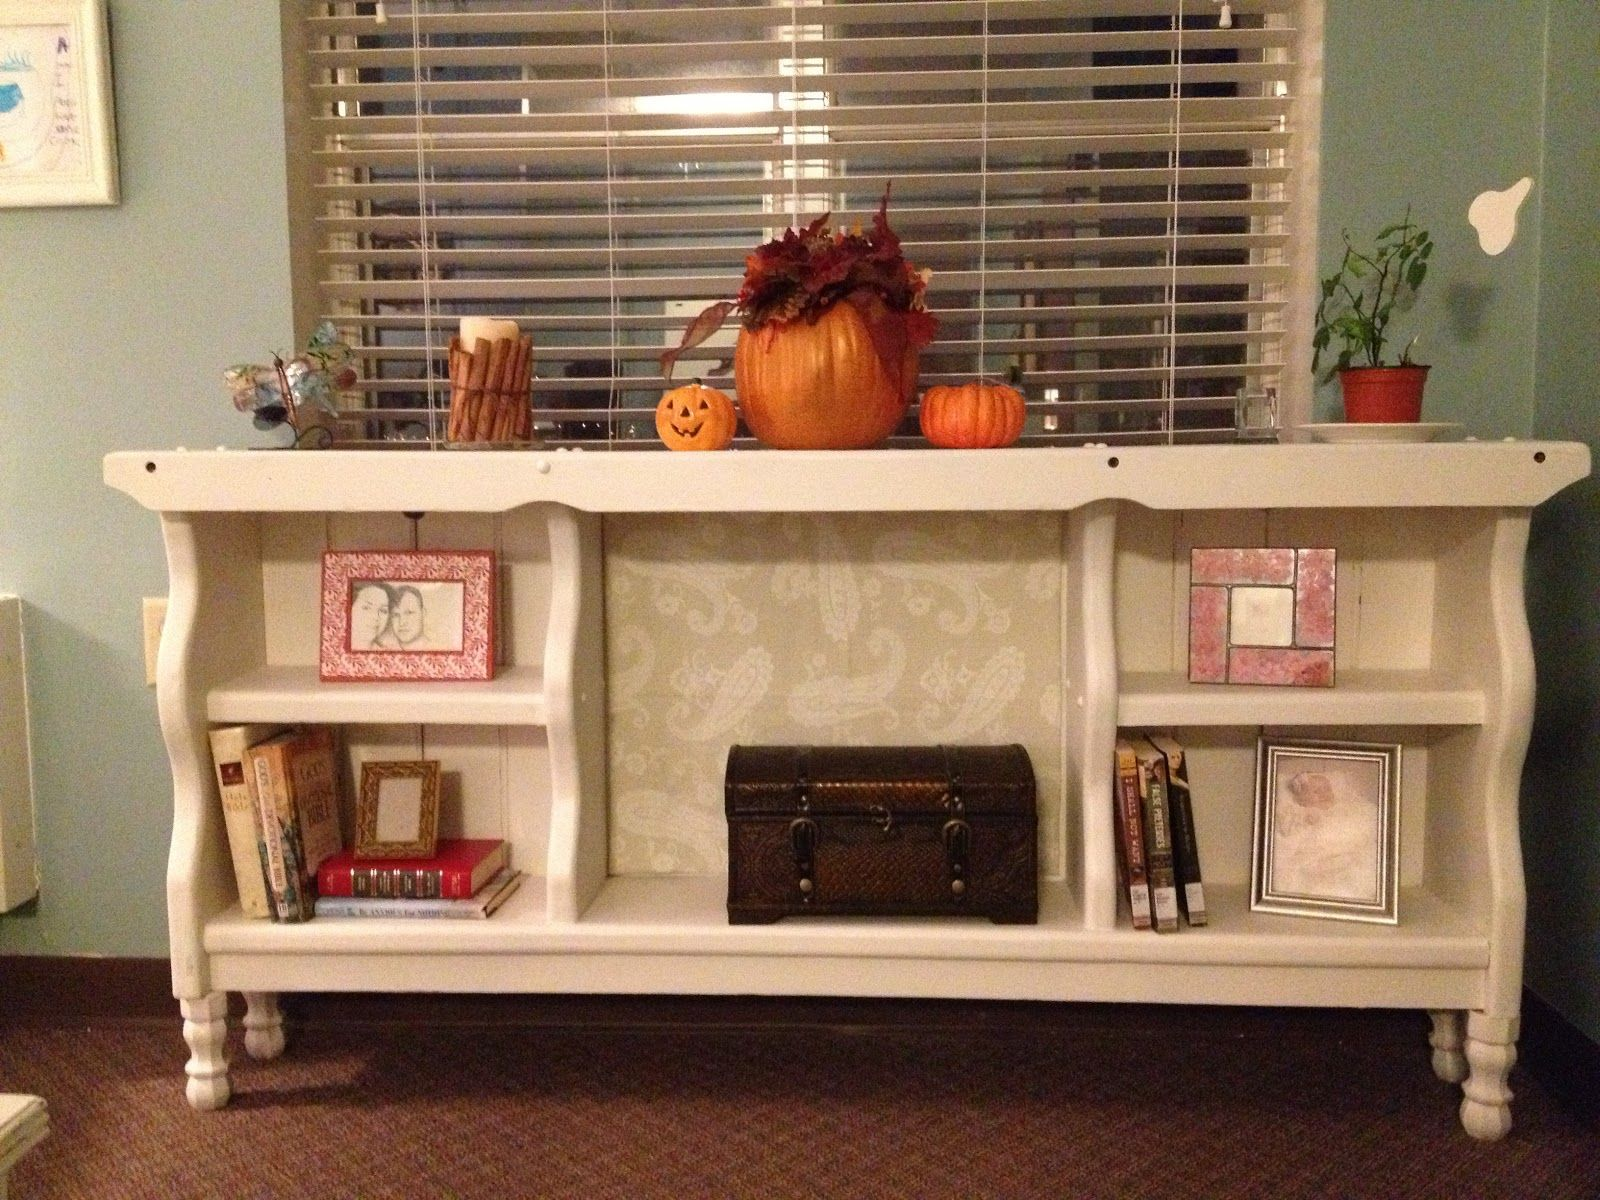 interior design interventions old waterbed headboard book shelf